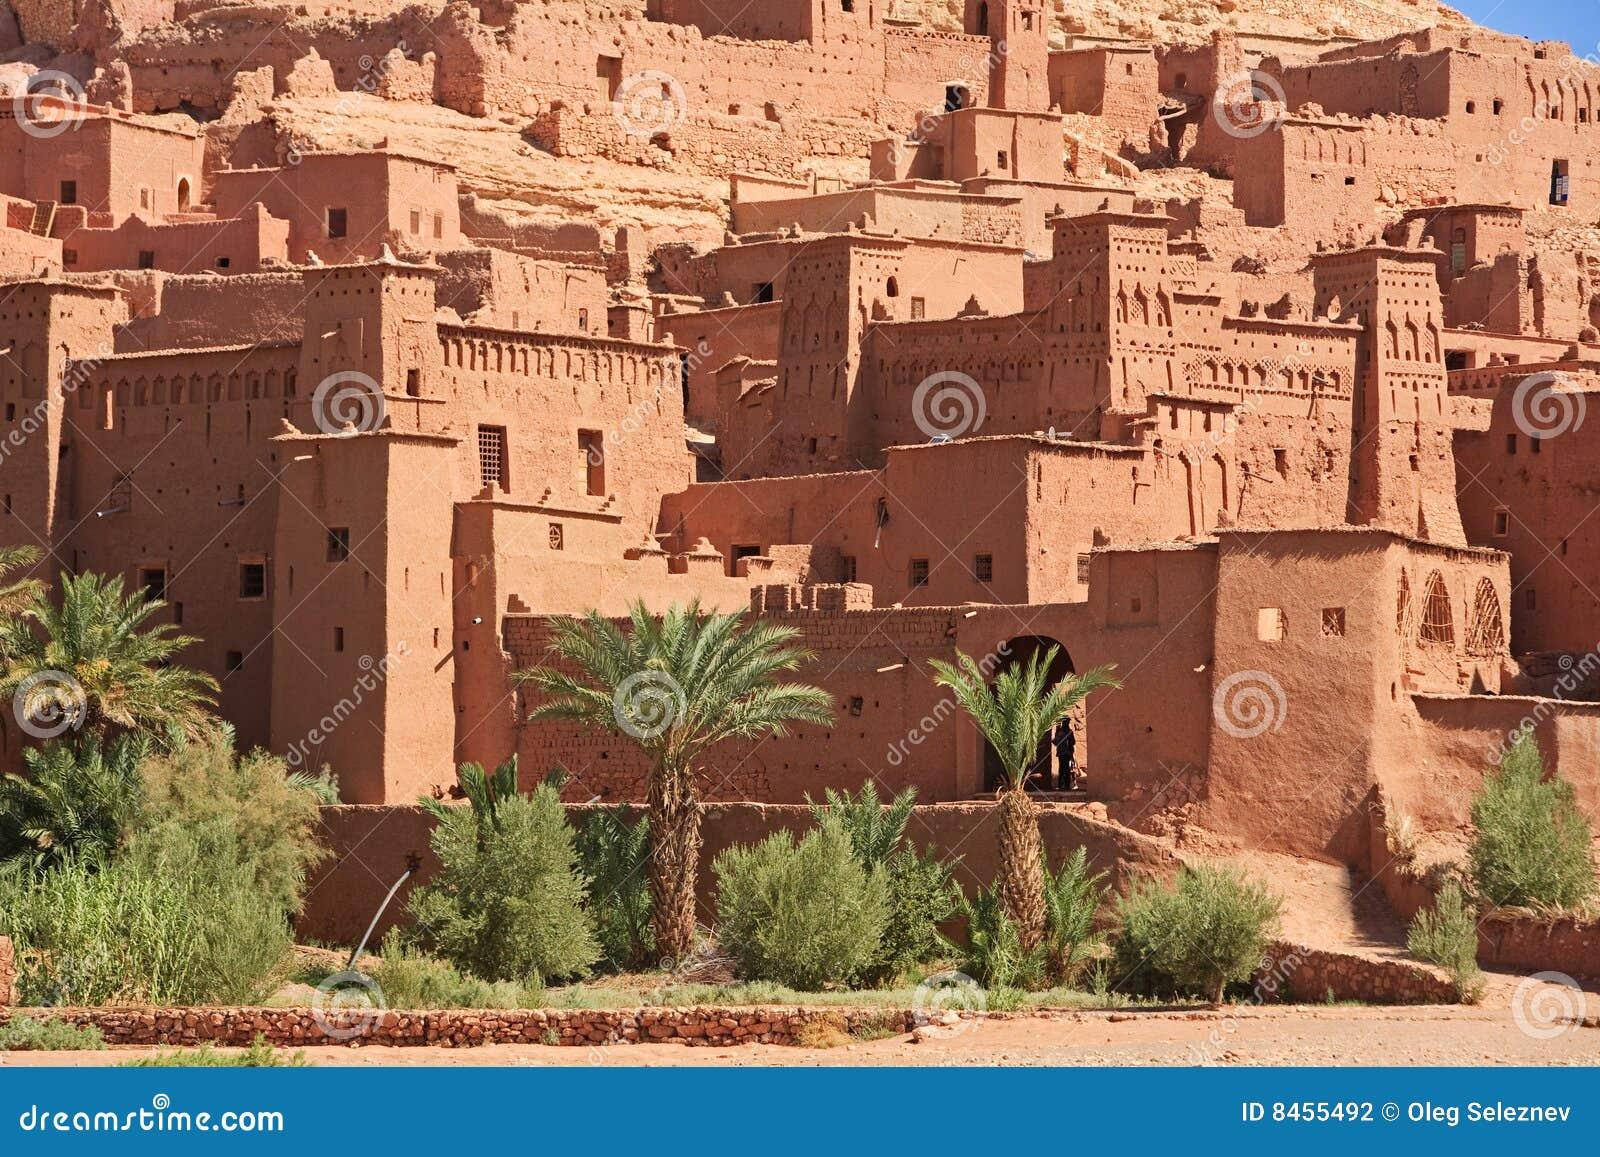 Casbah AIT Benhaddou Marocco